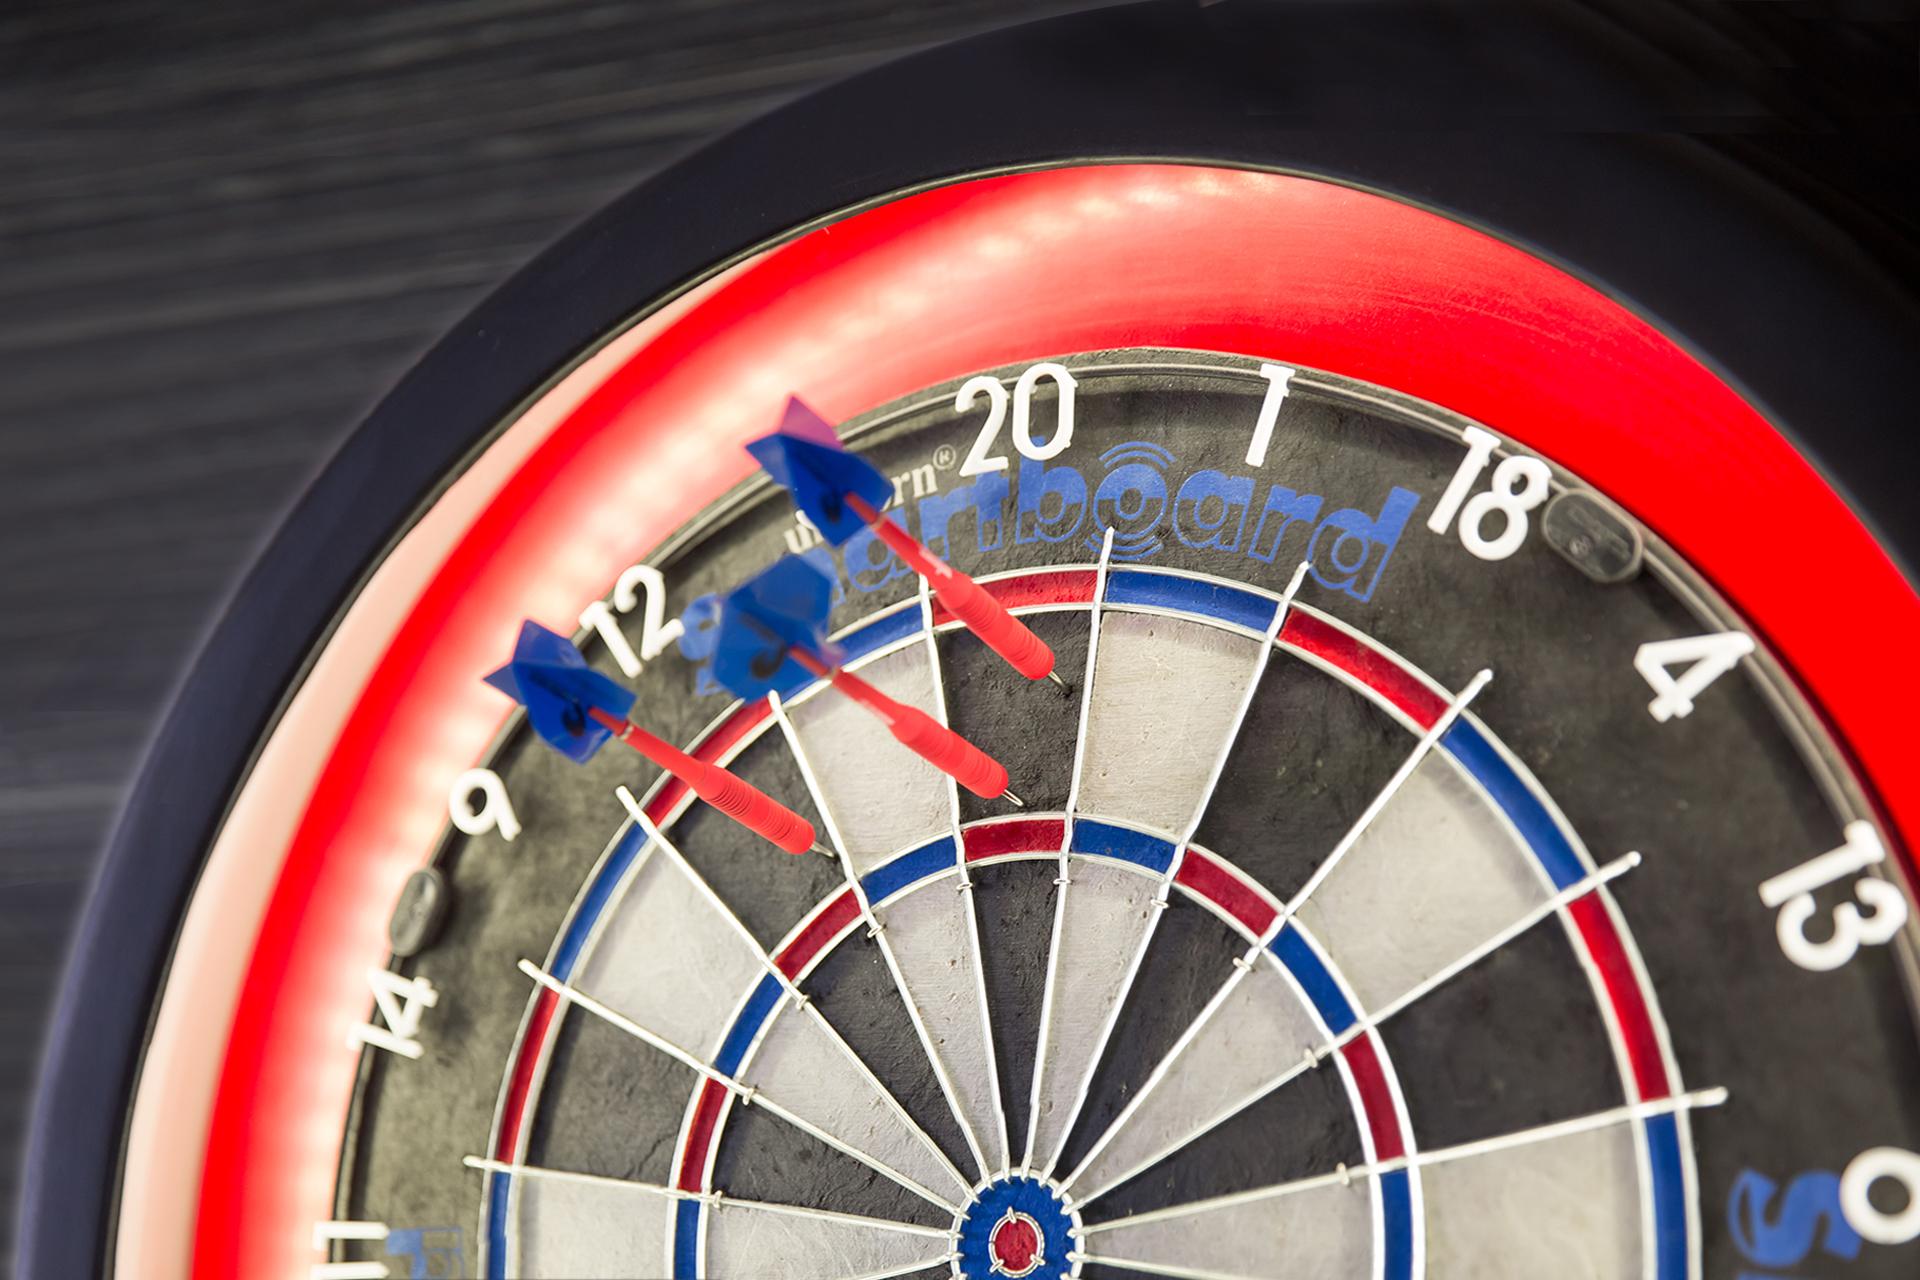 Smartboard darts